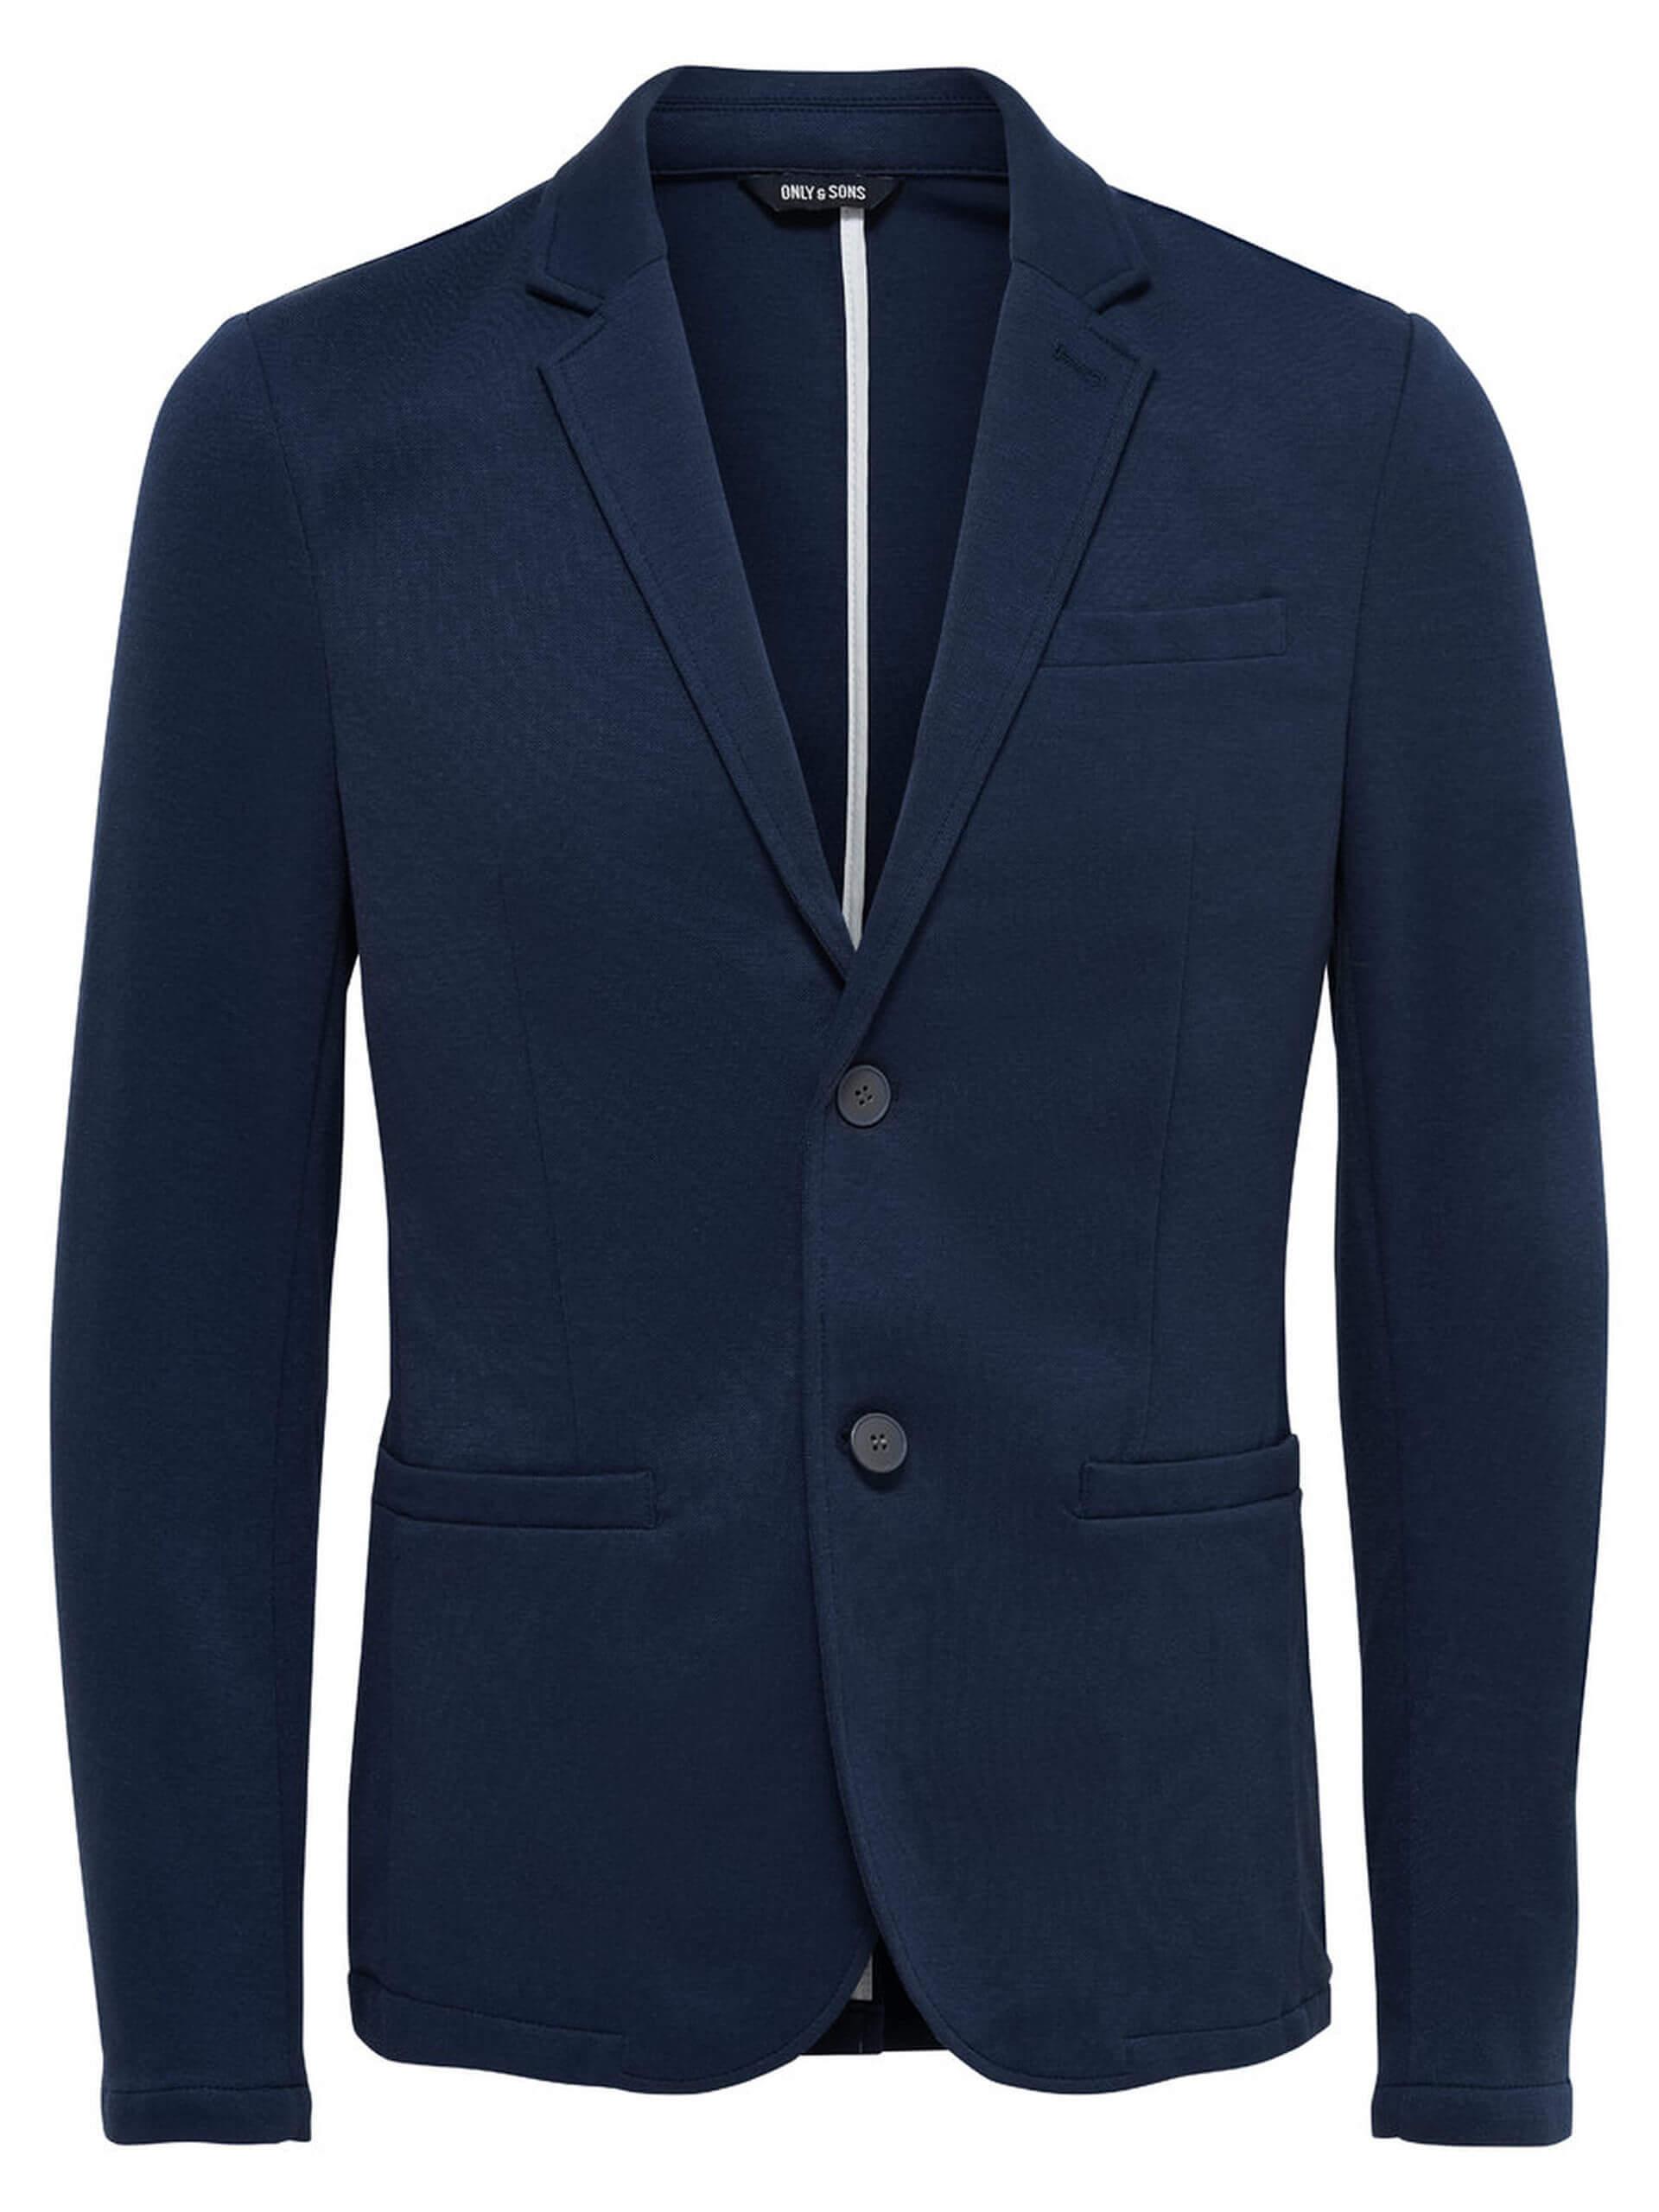 326ef3fce4 ONLY SONS Pánske sako Zavier Blazer Dress Blues Doprava ZDARMA ...